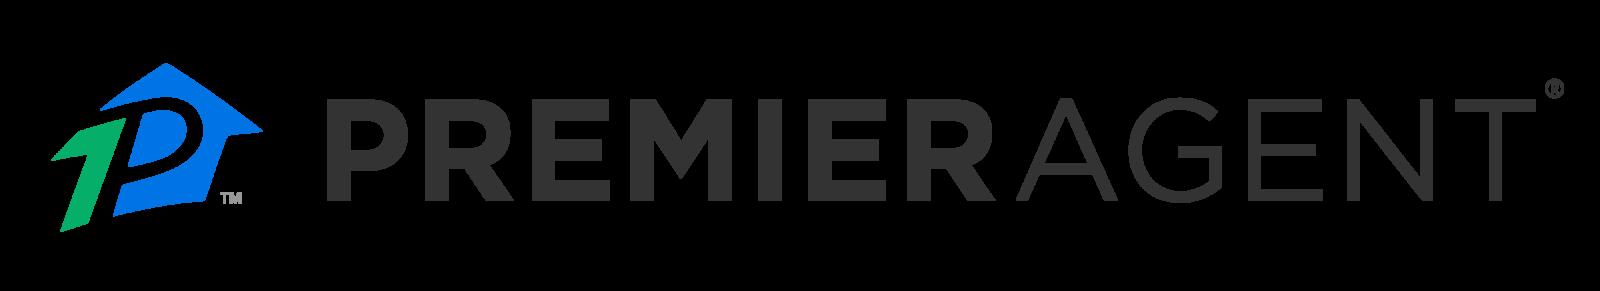 Zillow premier agent logo